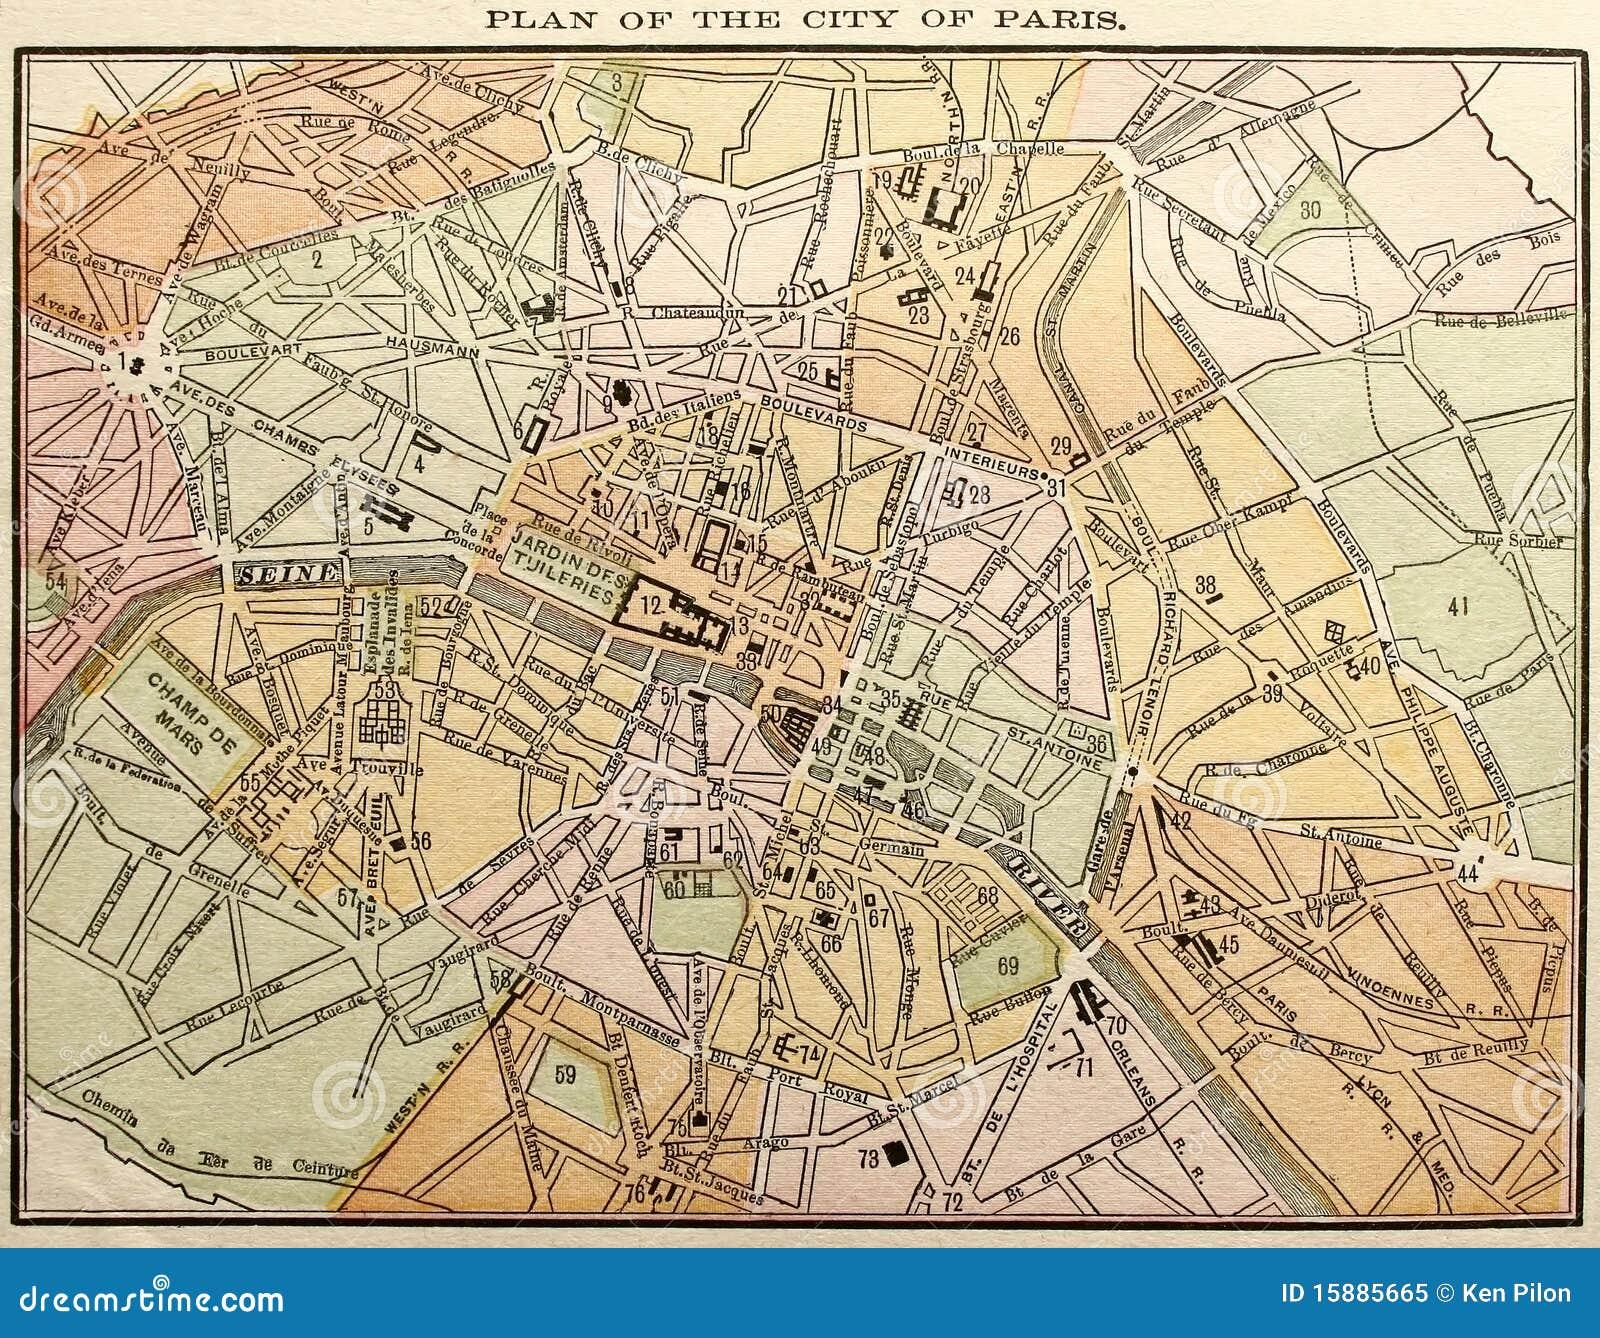 Old paris street map royalty free stock photo image 15885665 - Royalty Free Stock Photo Antique City Map Old Paris Street